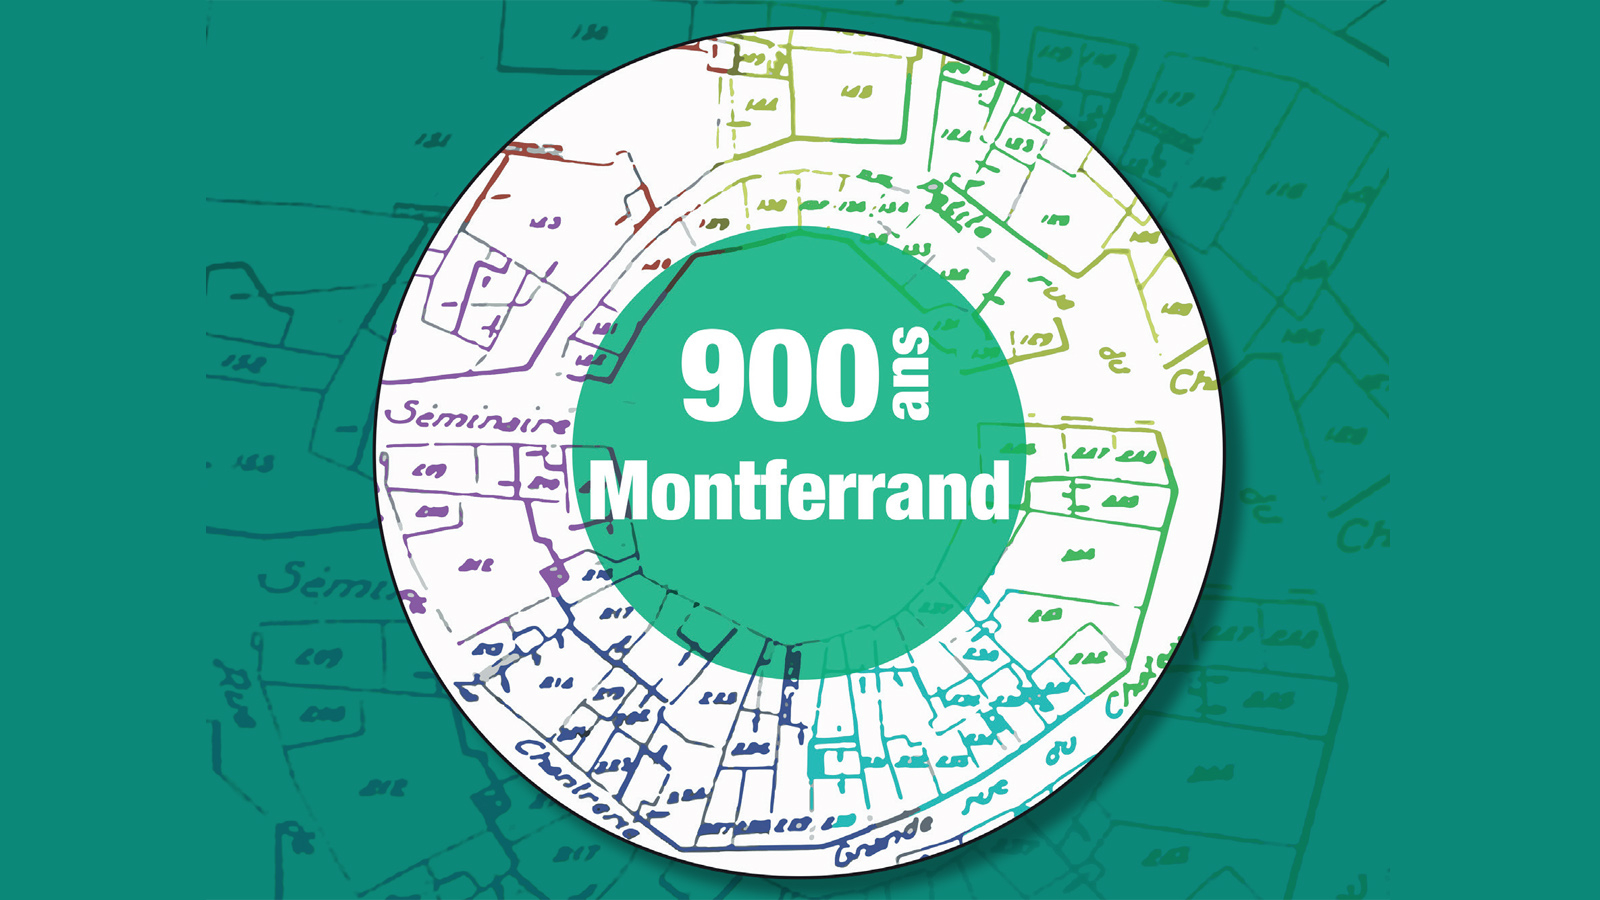 © 900 ans Montferrand